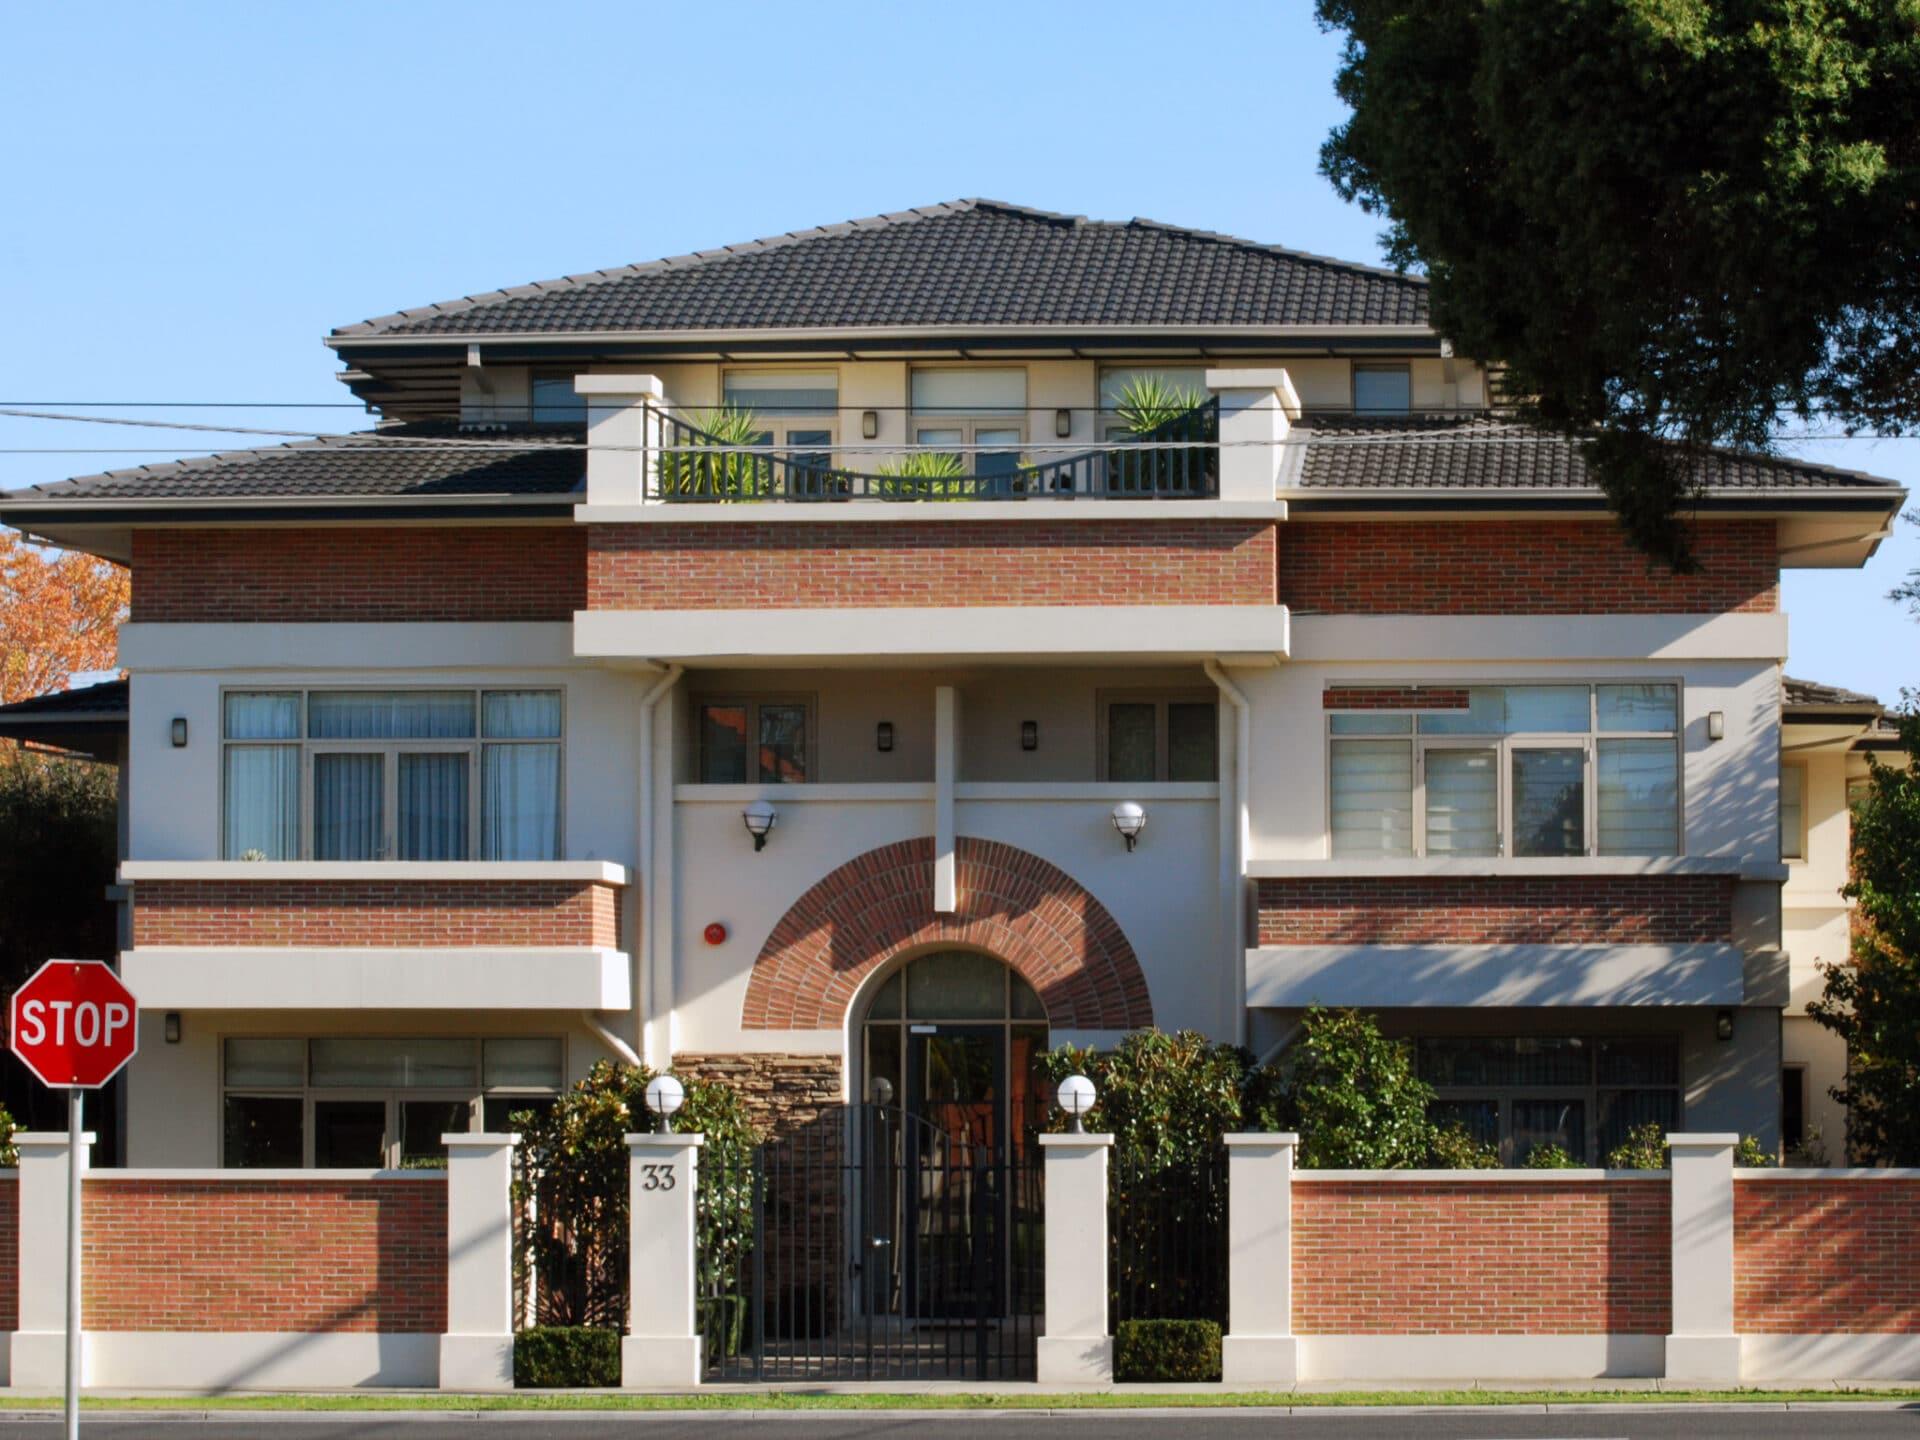 72 dpi KooyongH2 0000 Layer 3 1 - Kooyong Rd Apartments, Caulfield, Australia